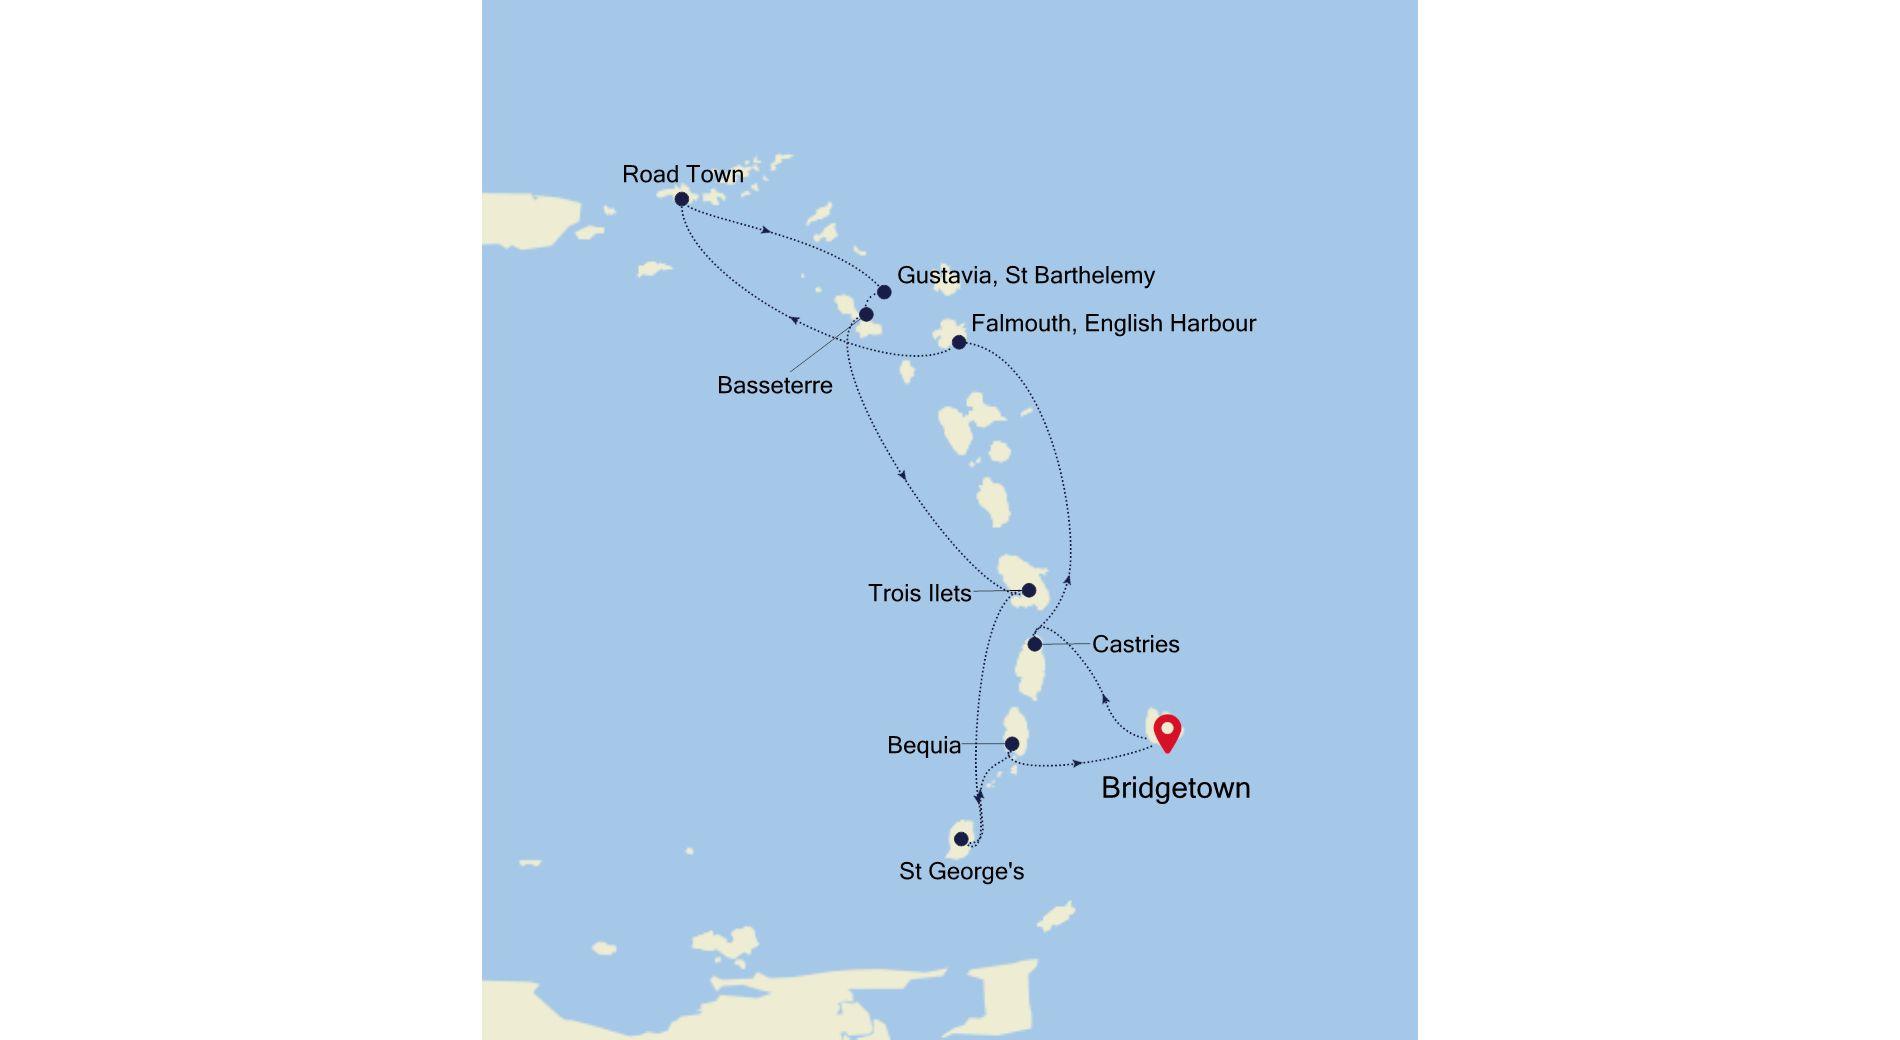 WH201120009 - Bridgetown nach Bridgetown